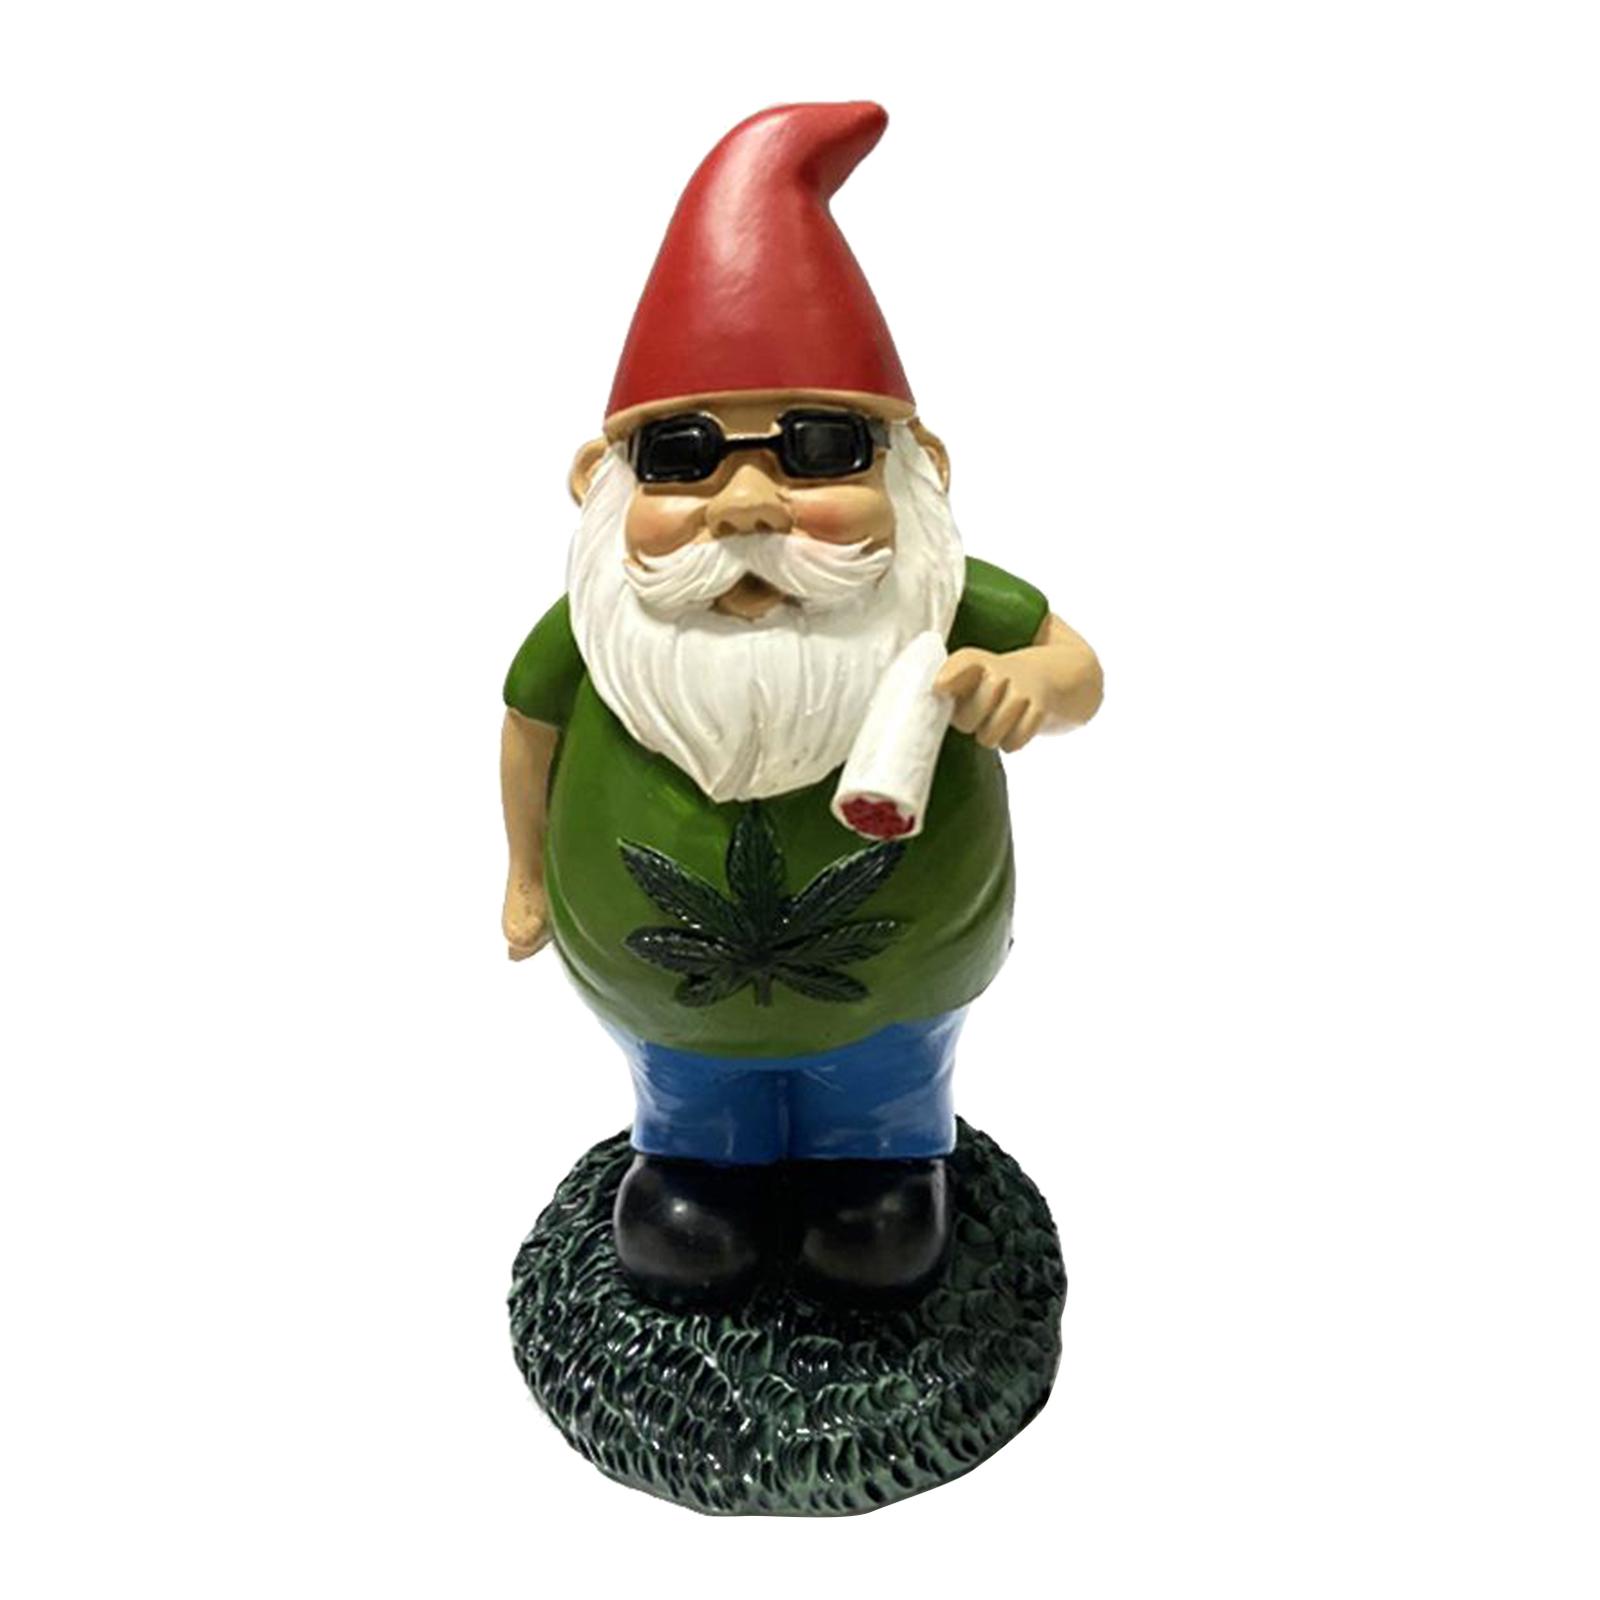 thumbnail 37 - Funny Resin Naughty Garden Gnome Statue Ornaments Villa Home Figurines Decor